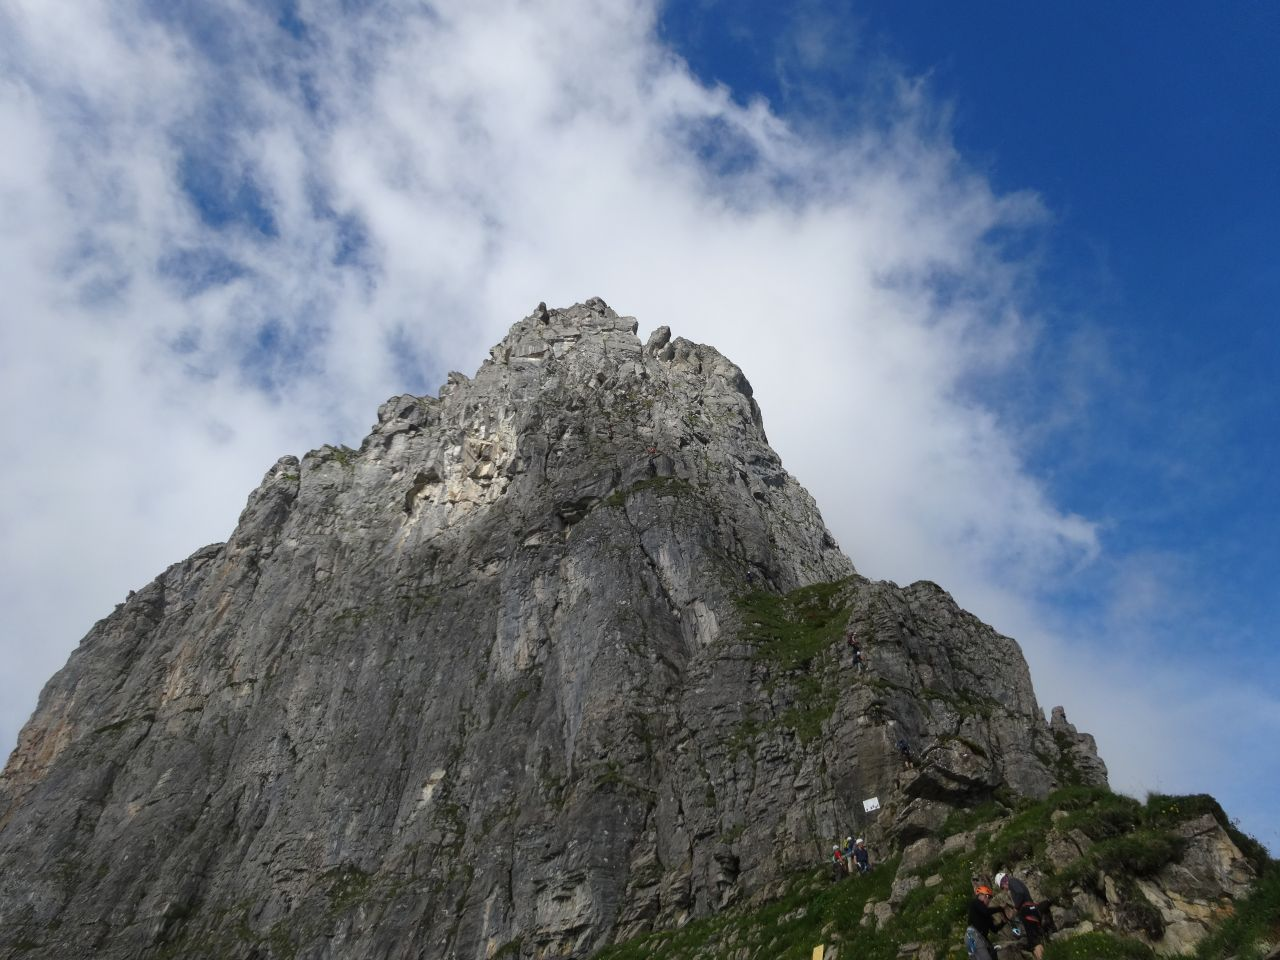 Klettersteig Braunwald : Braunwald klettersteig alpenverein